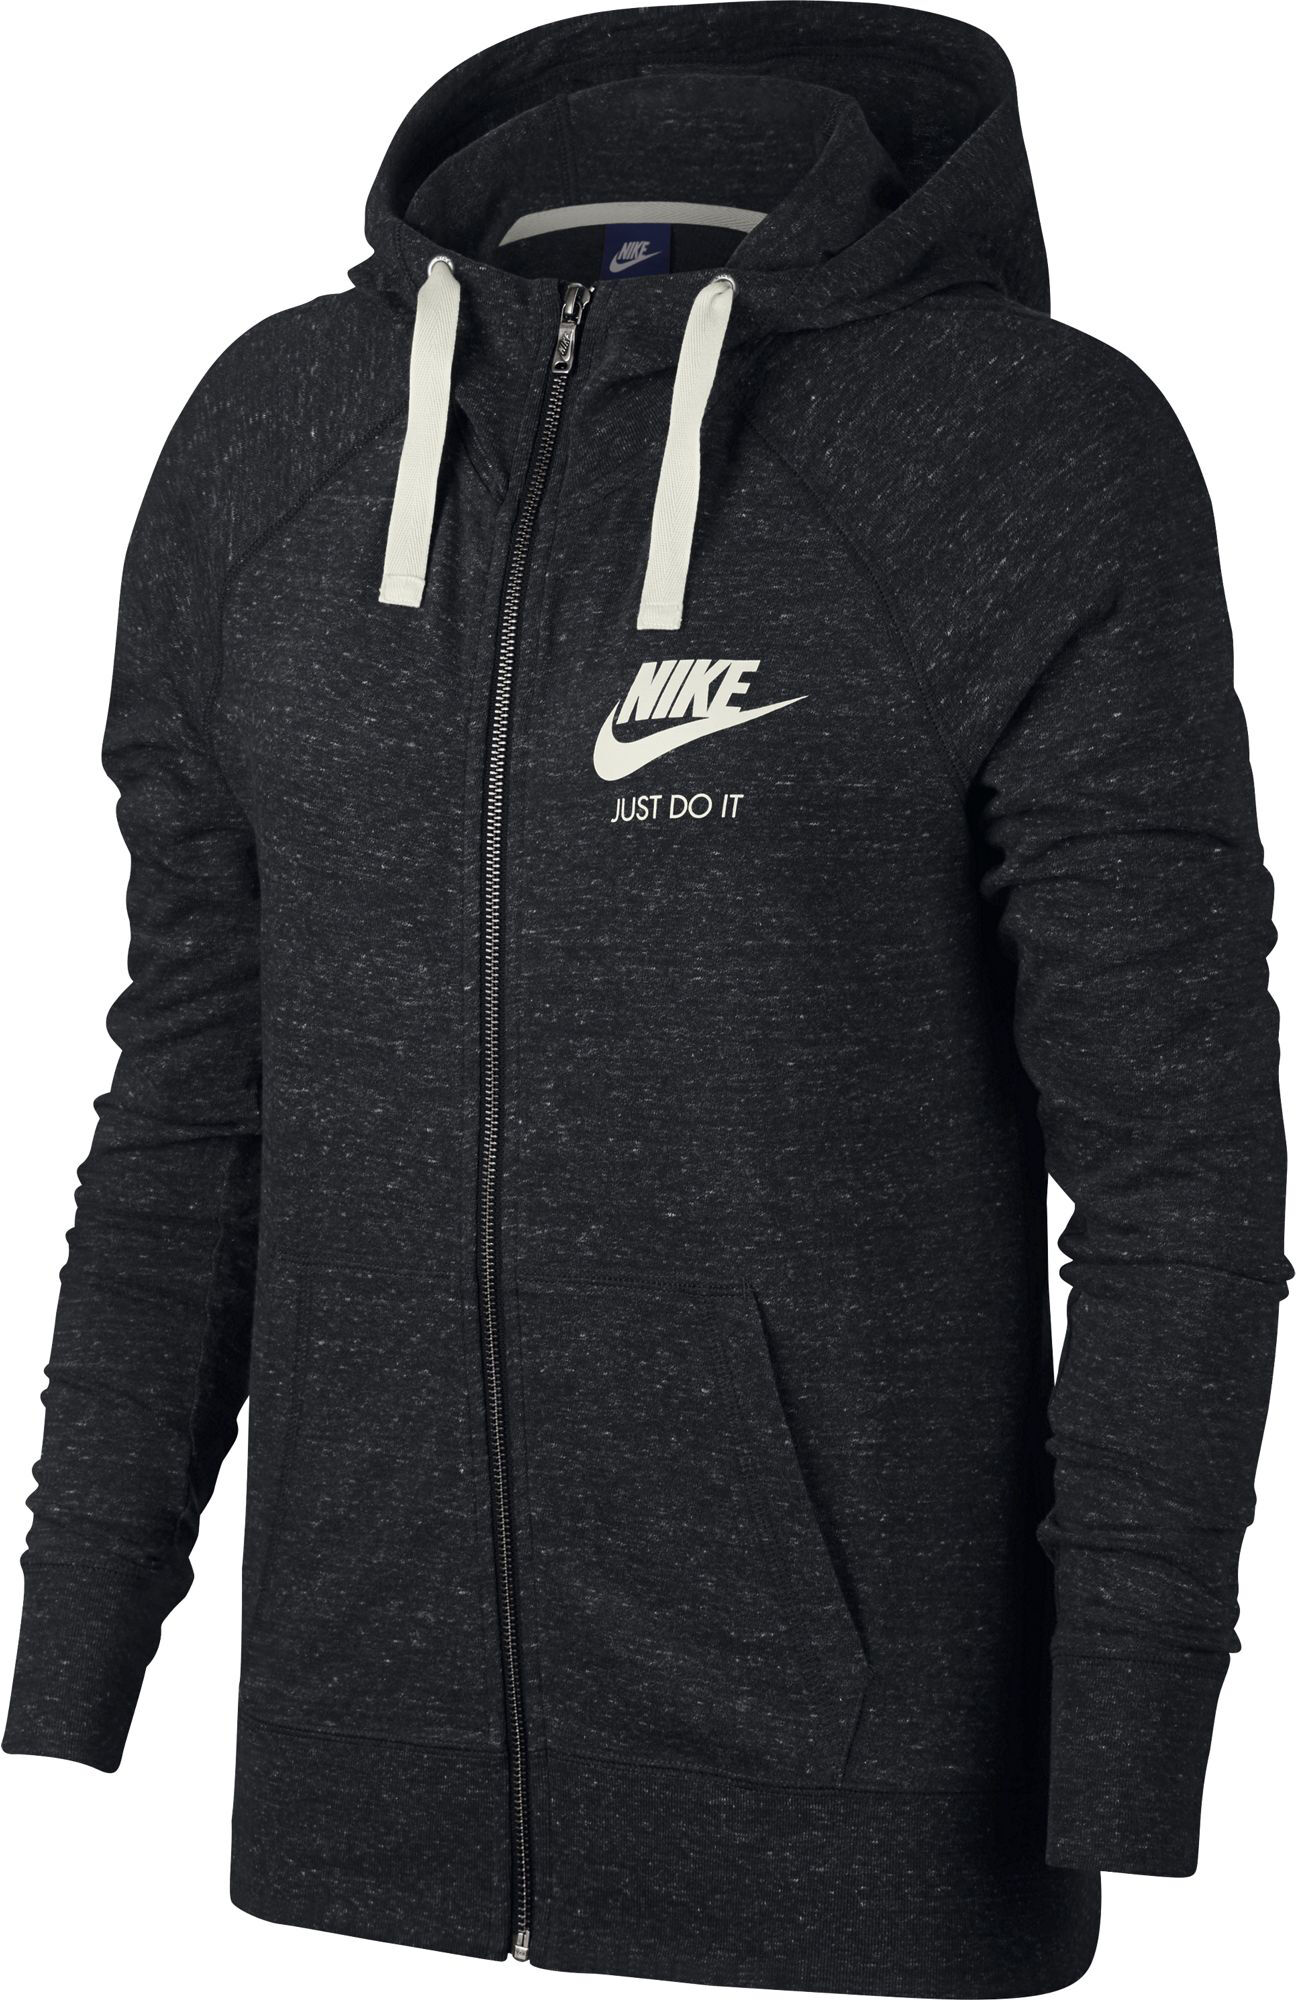 Nike Sportswear Gym Vintage Sweatjacke Damen Schwarz, Weiß